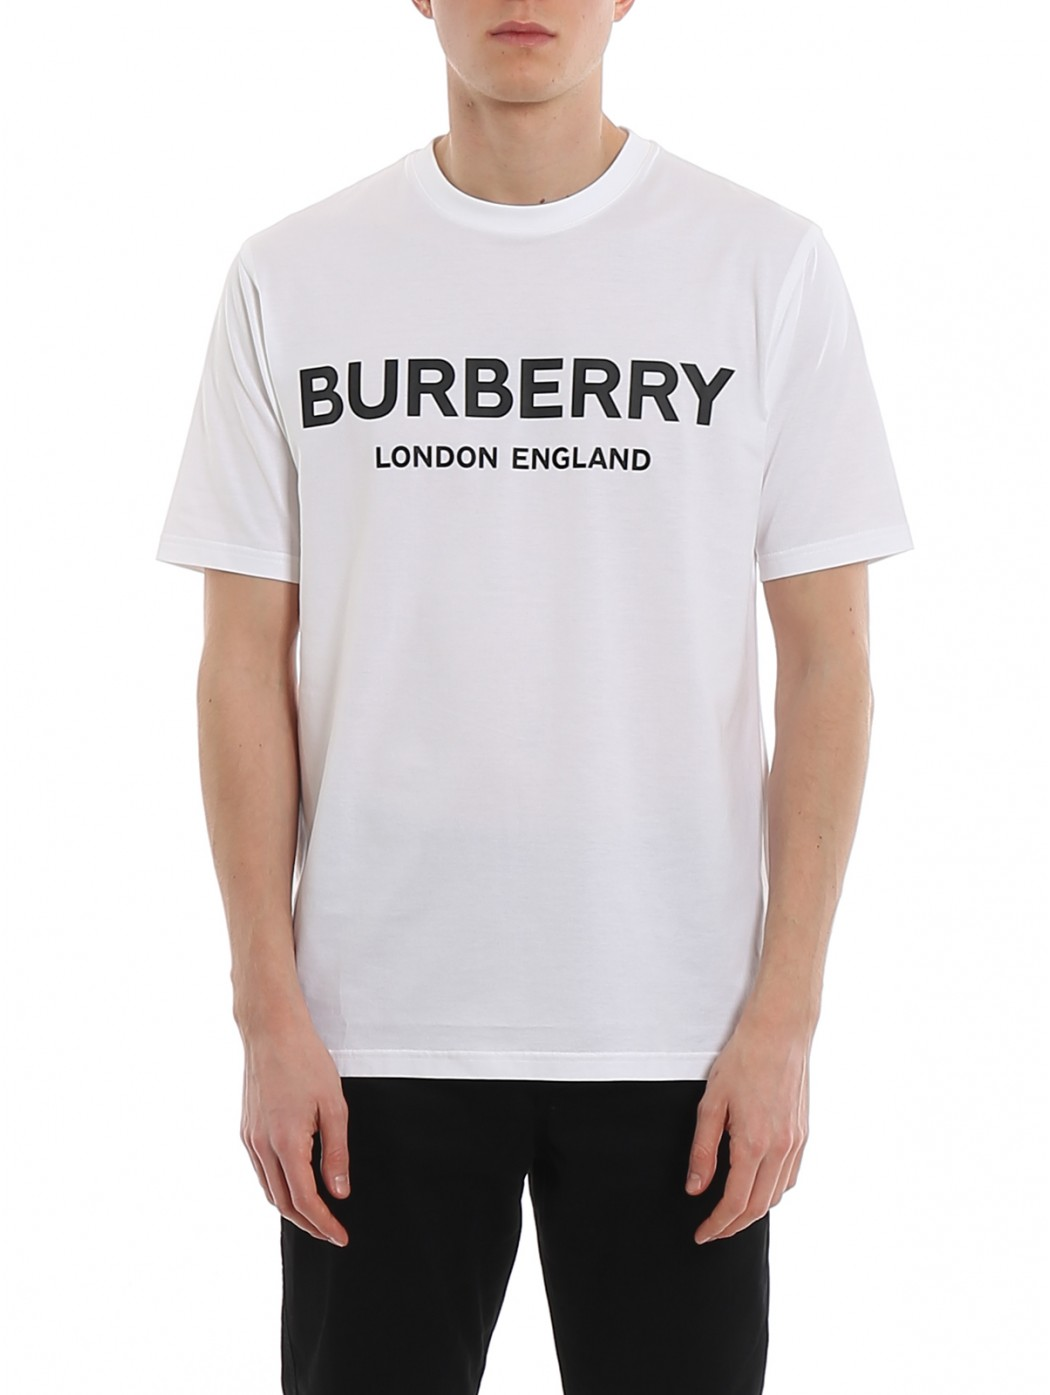 T-SHIRT BURBERRY 8026017M:LETCHFOR WHITE